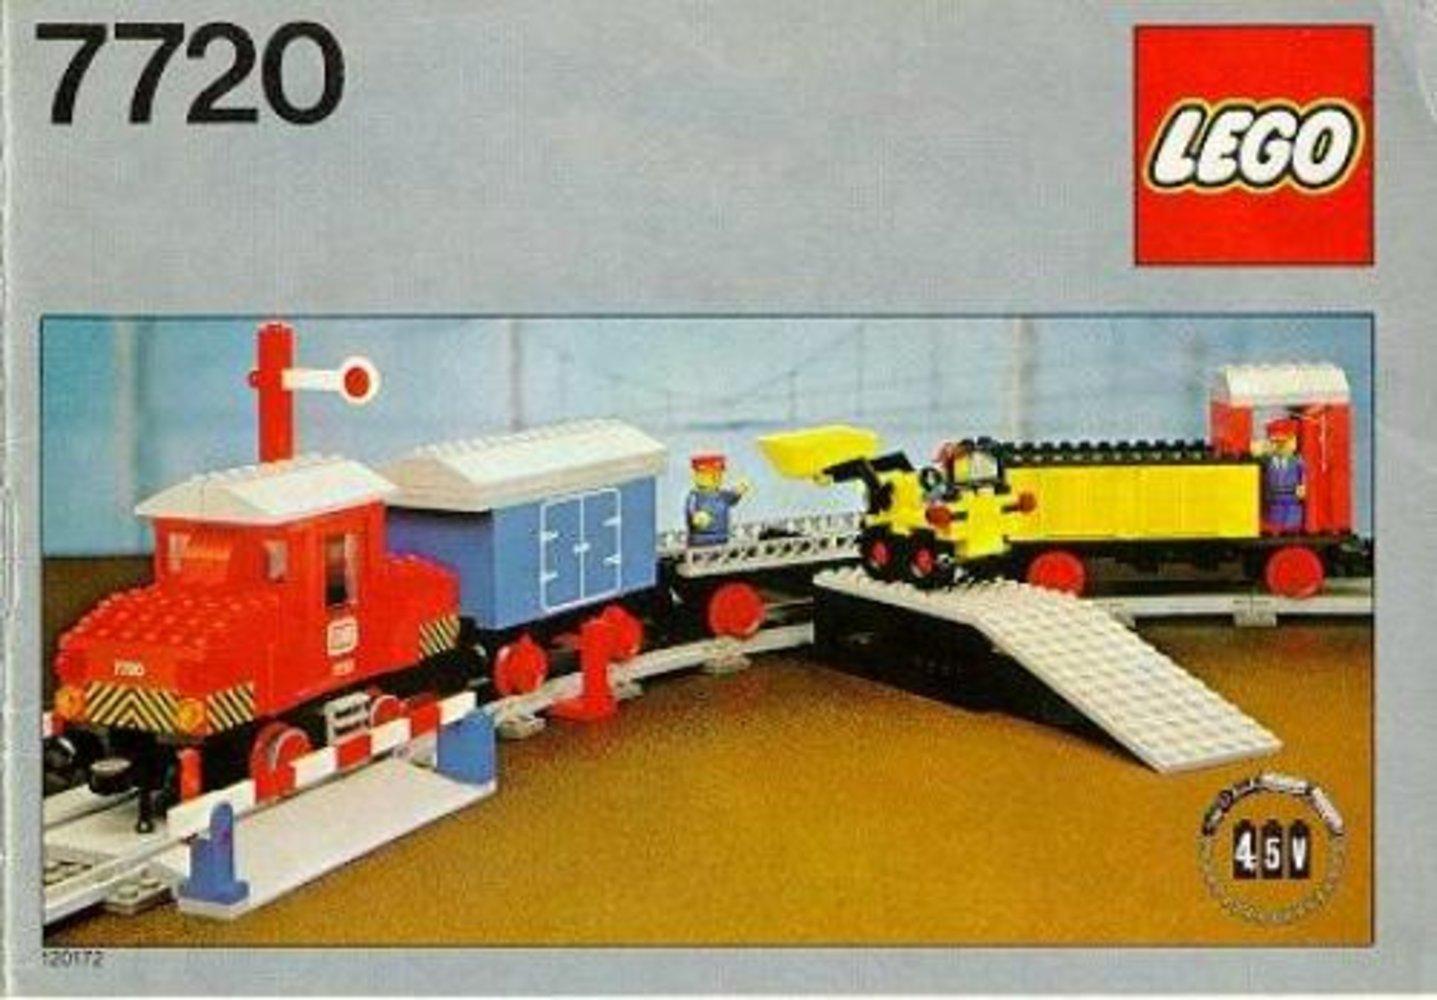 Diesel Freight Train Set, battery